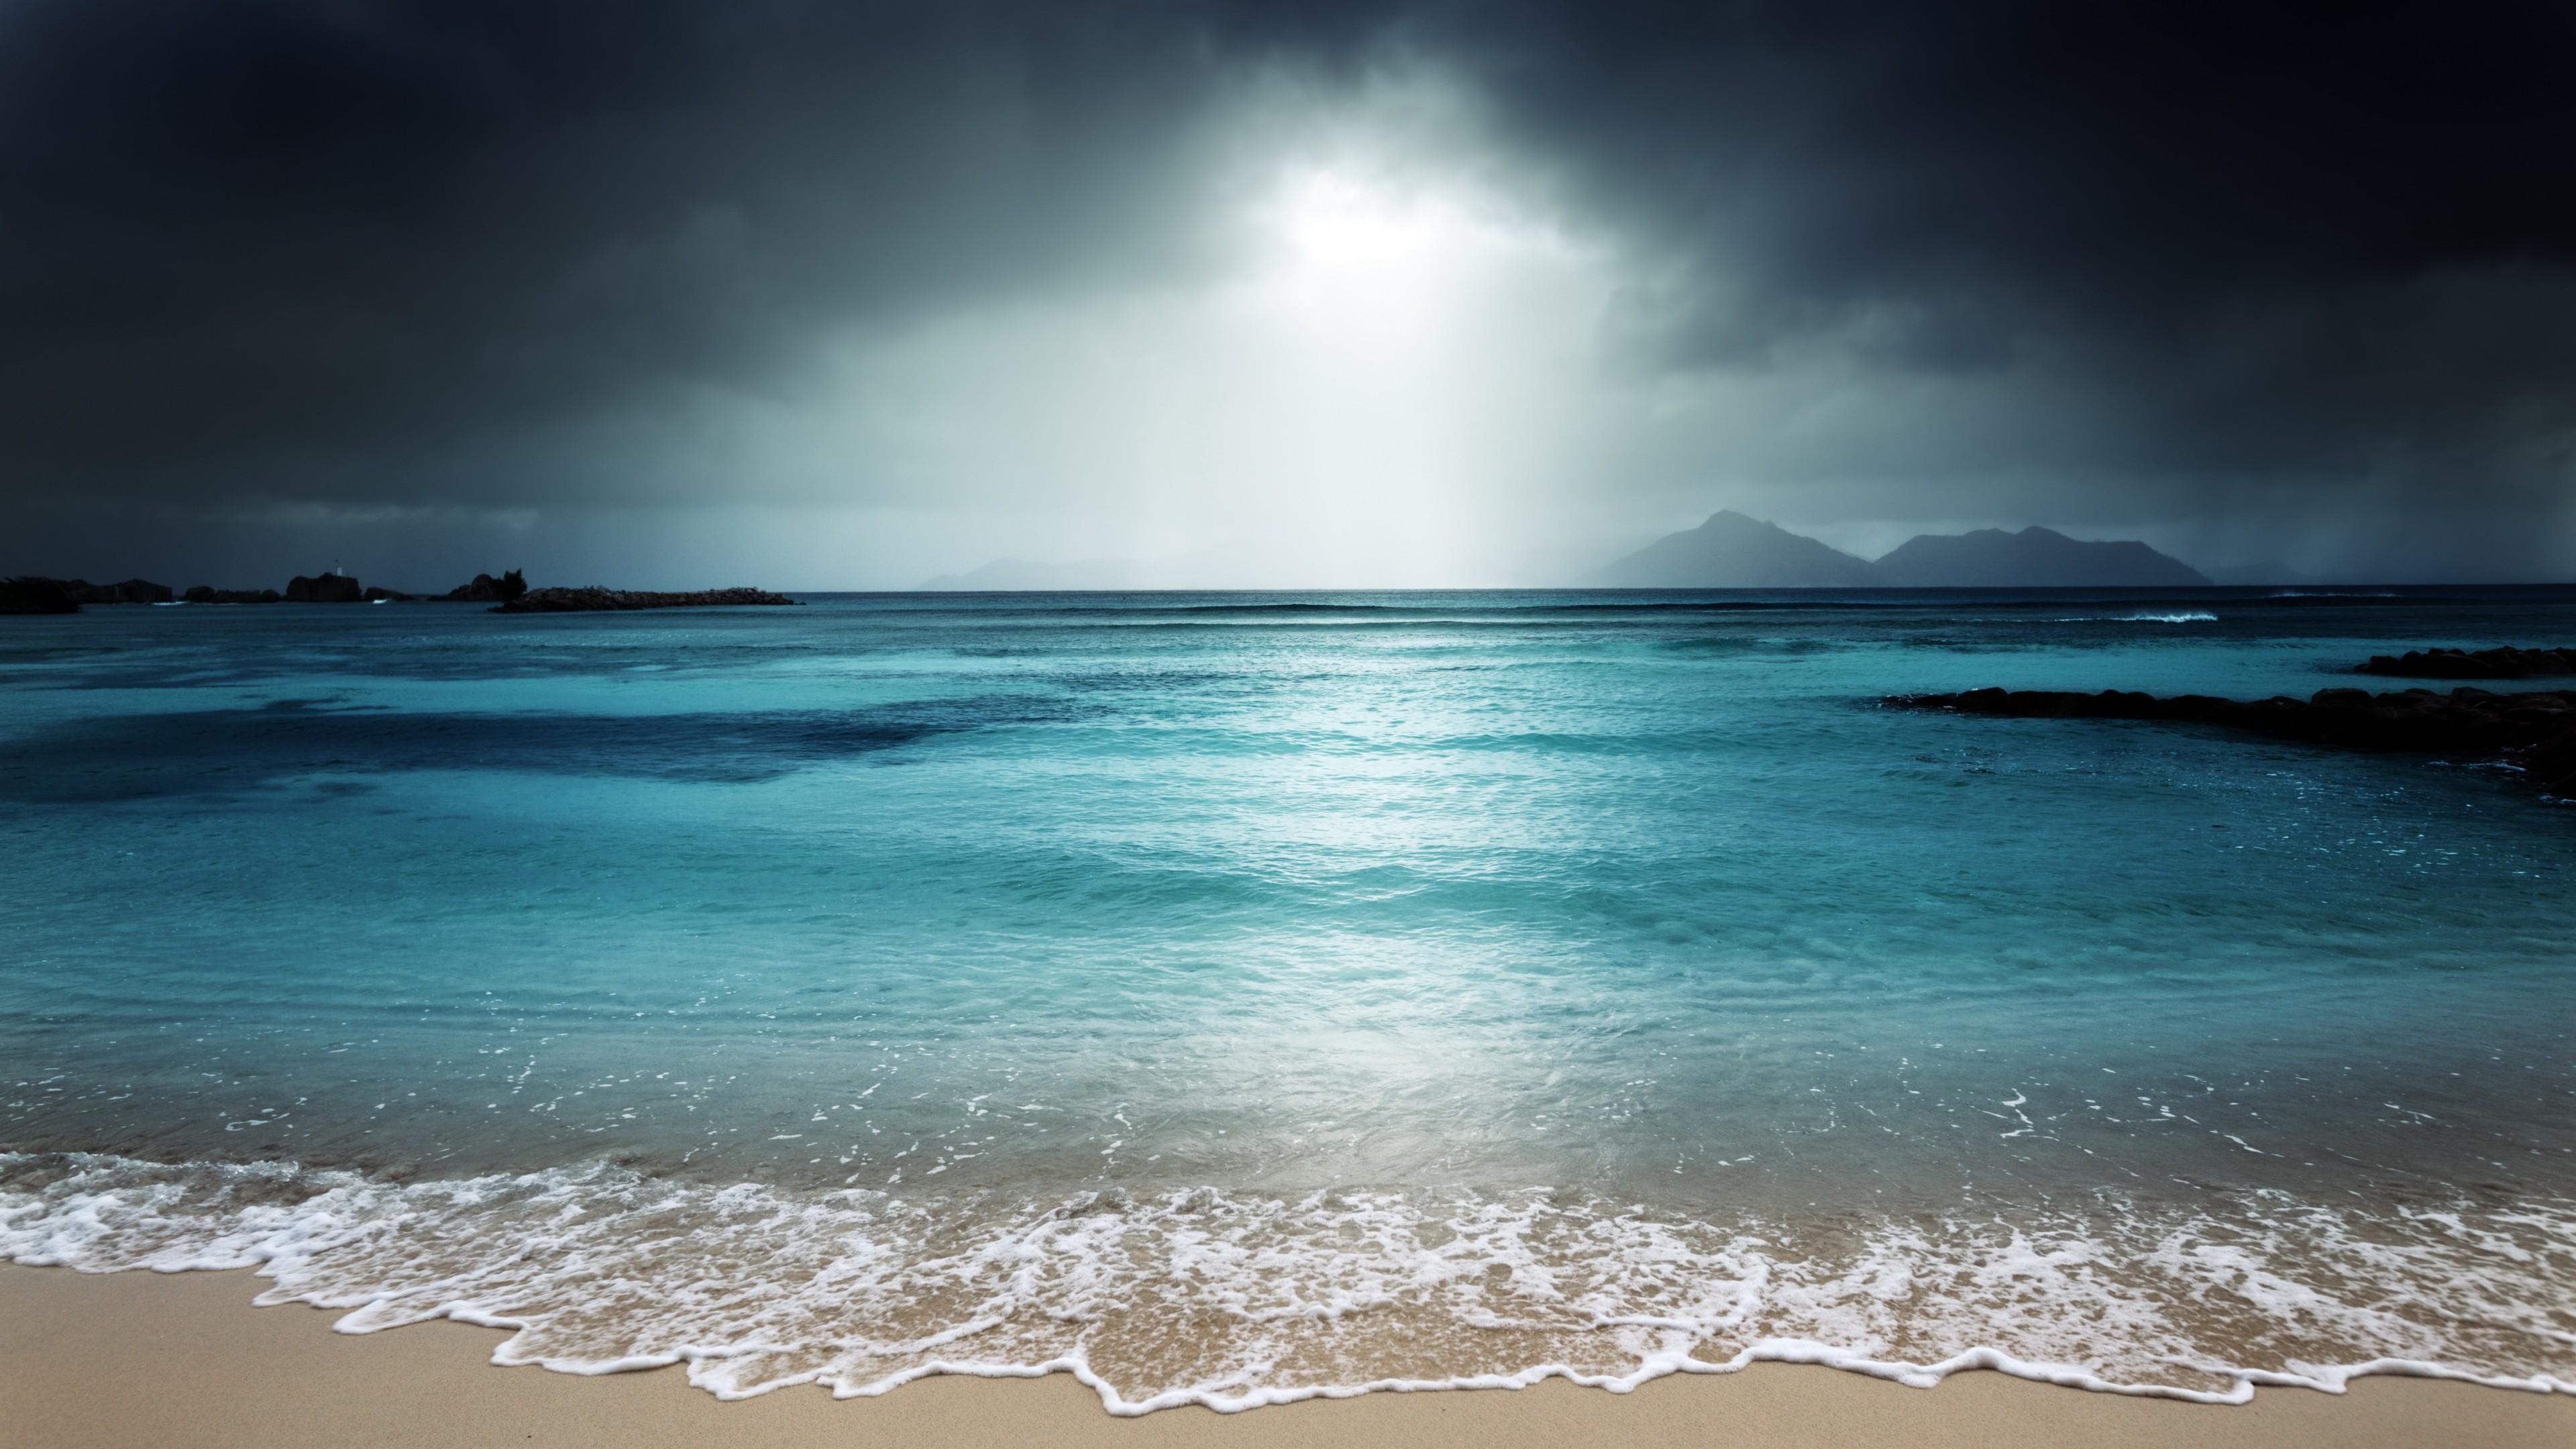 la_digue_island_beach_dark_sky_storm_5k